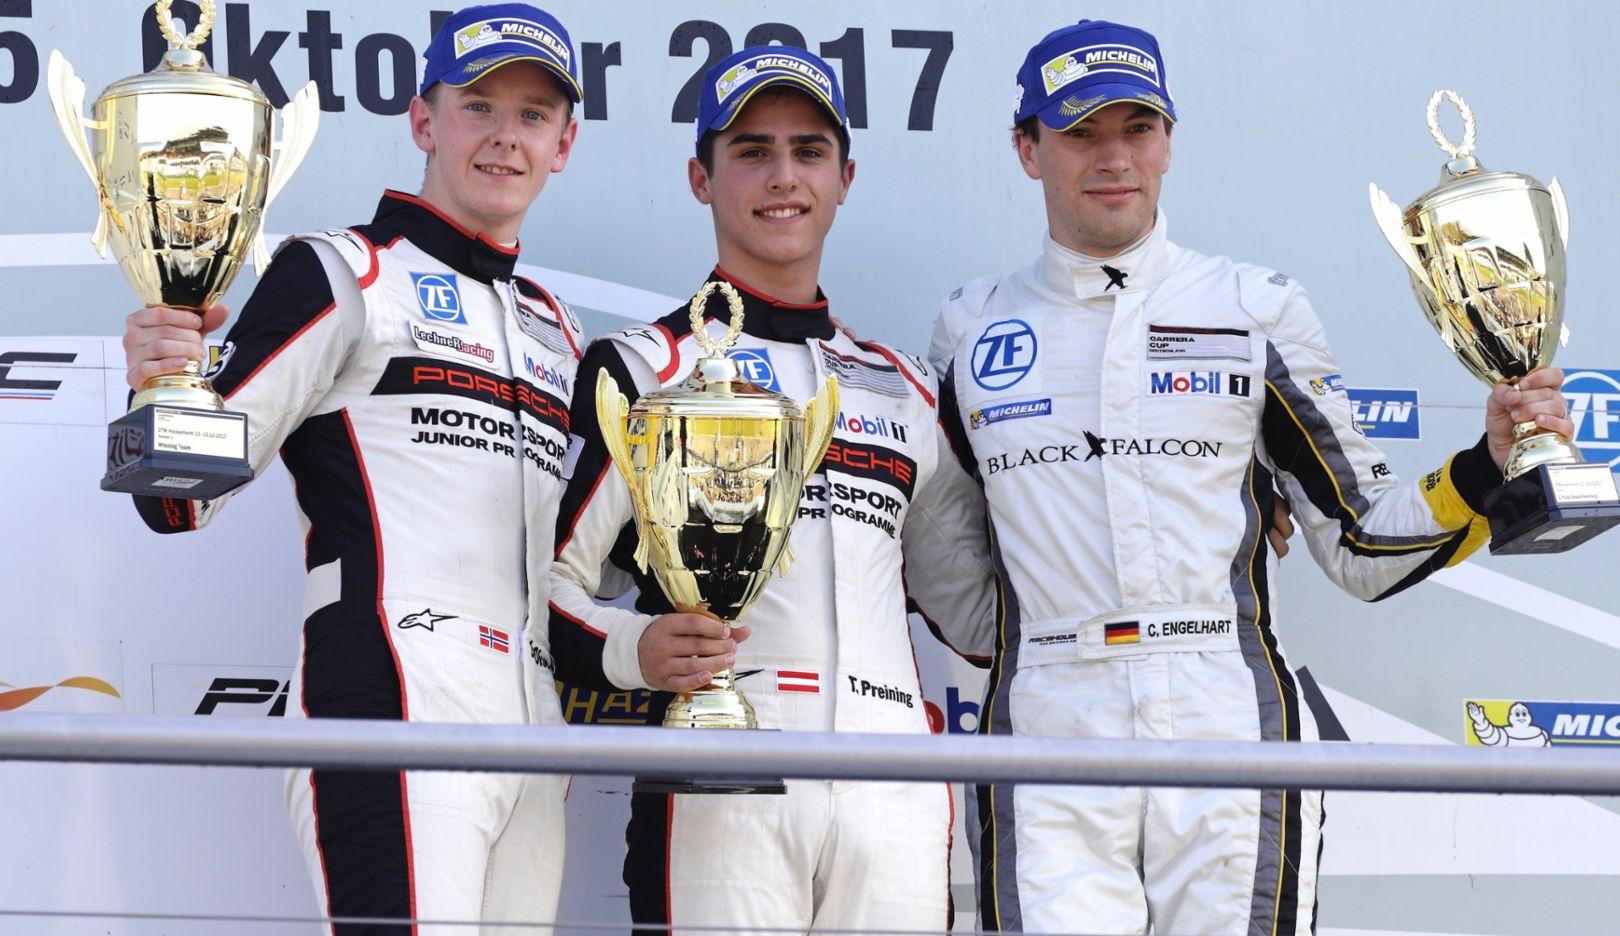 Dennis Olsen, Thomas Preining, Christian Engelhart, l-r, Porsche Carrera Cup Deutschland, Hockenheimring, 2017, Porsche AG